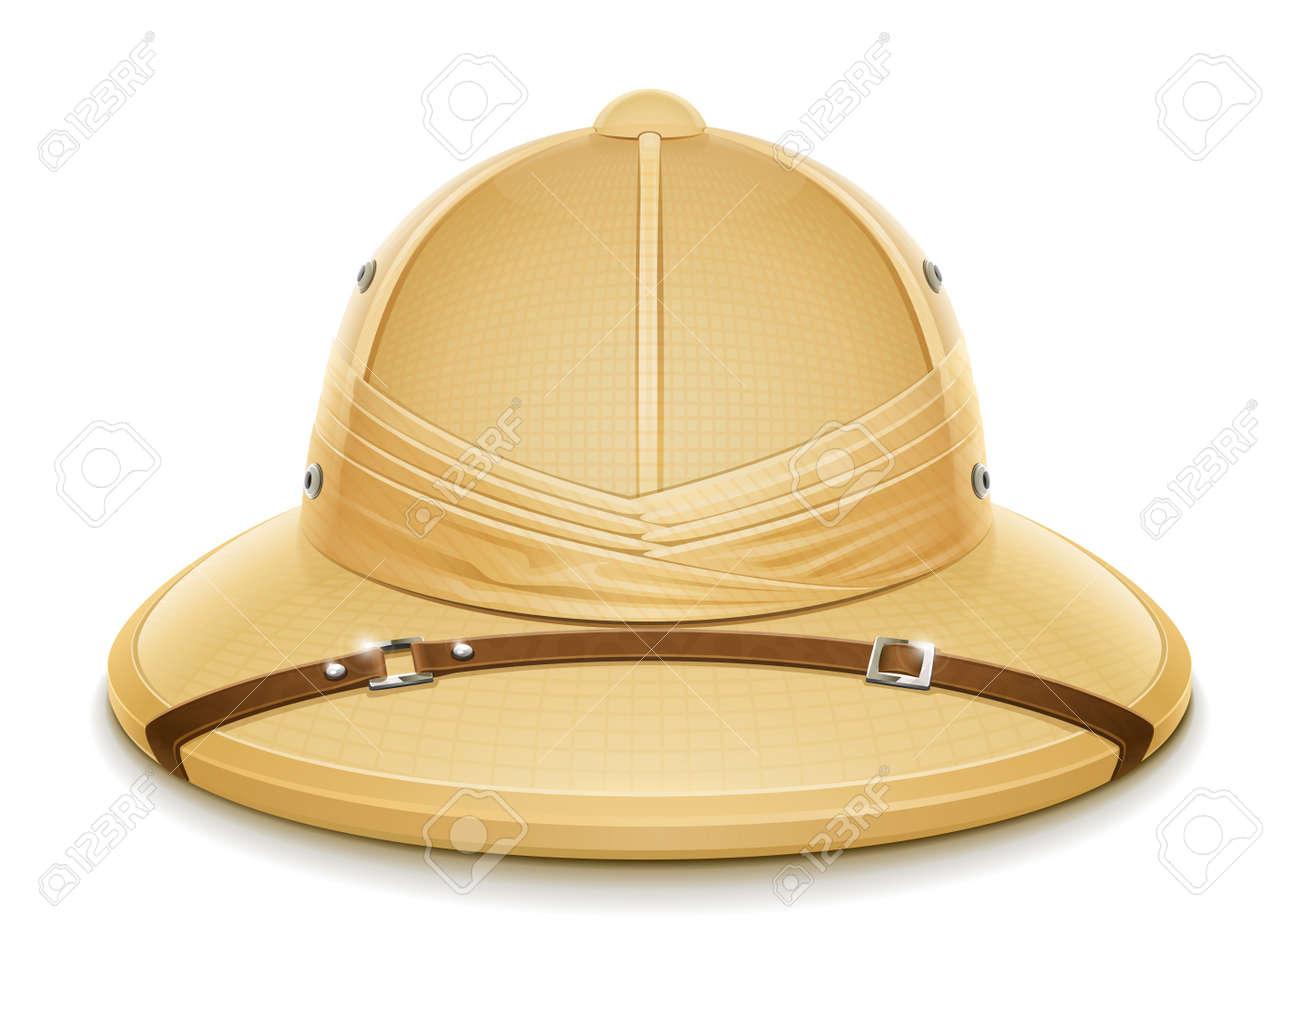 pith helmet hat for safari vector illustration isolated on white background - 15269482